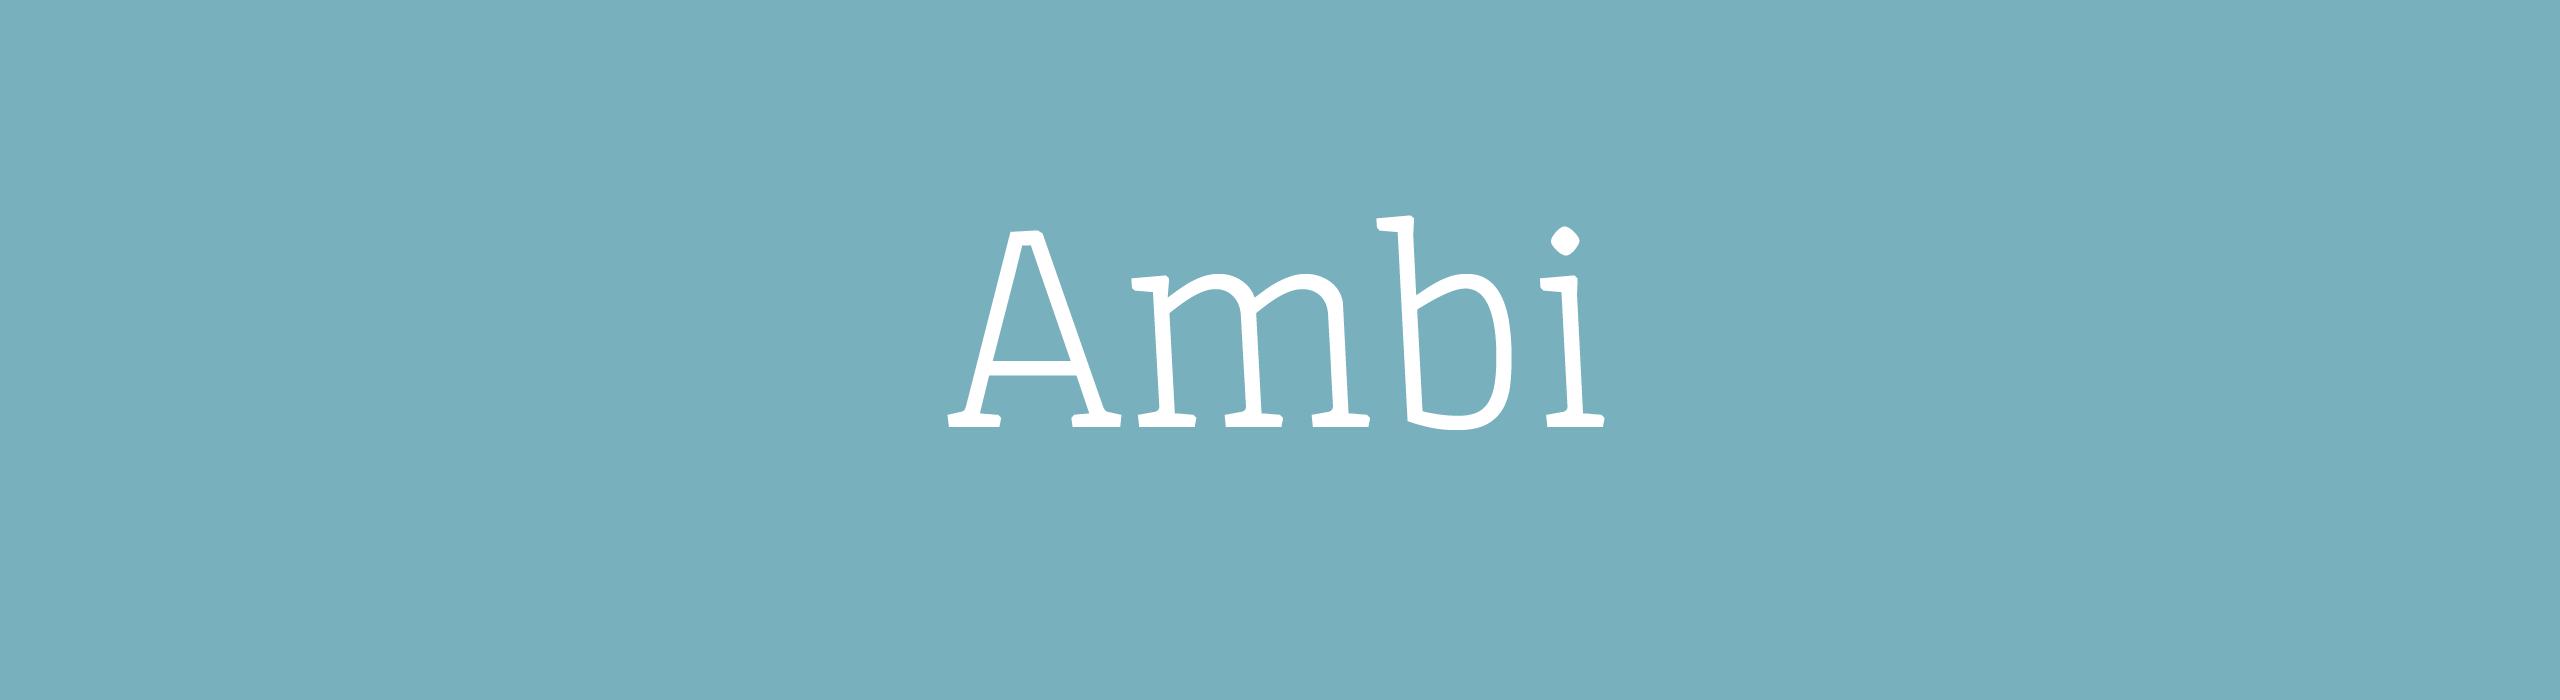 ITT_Ambi